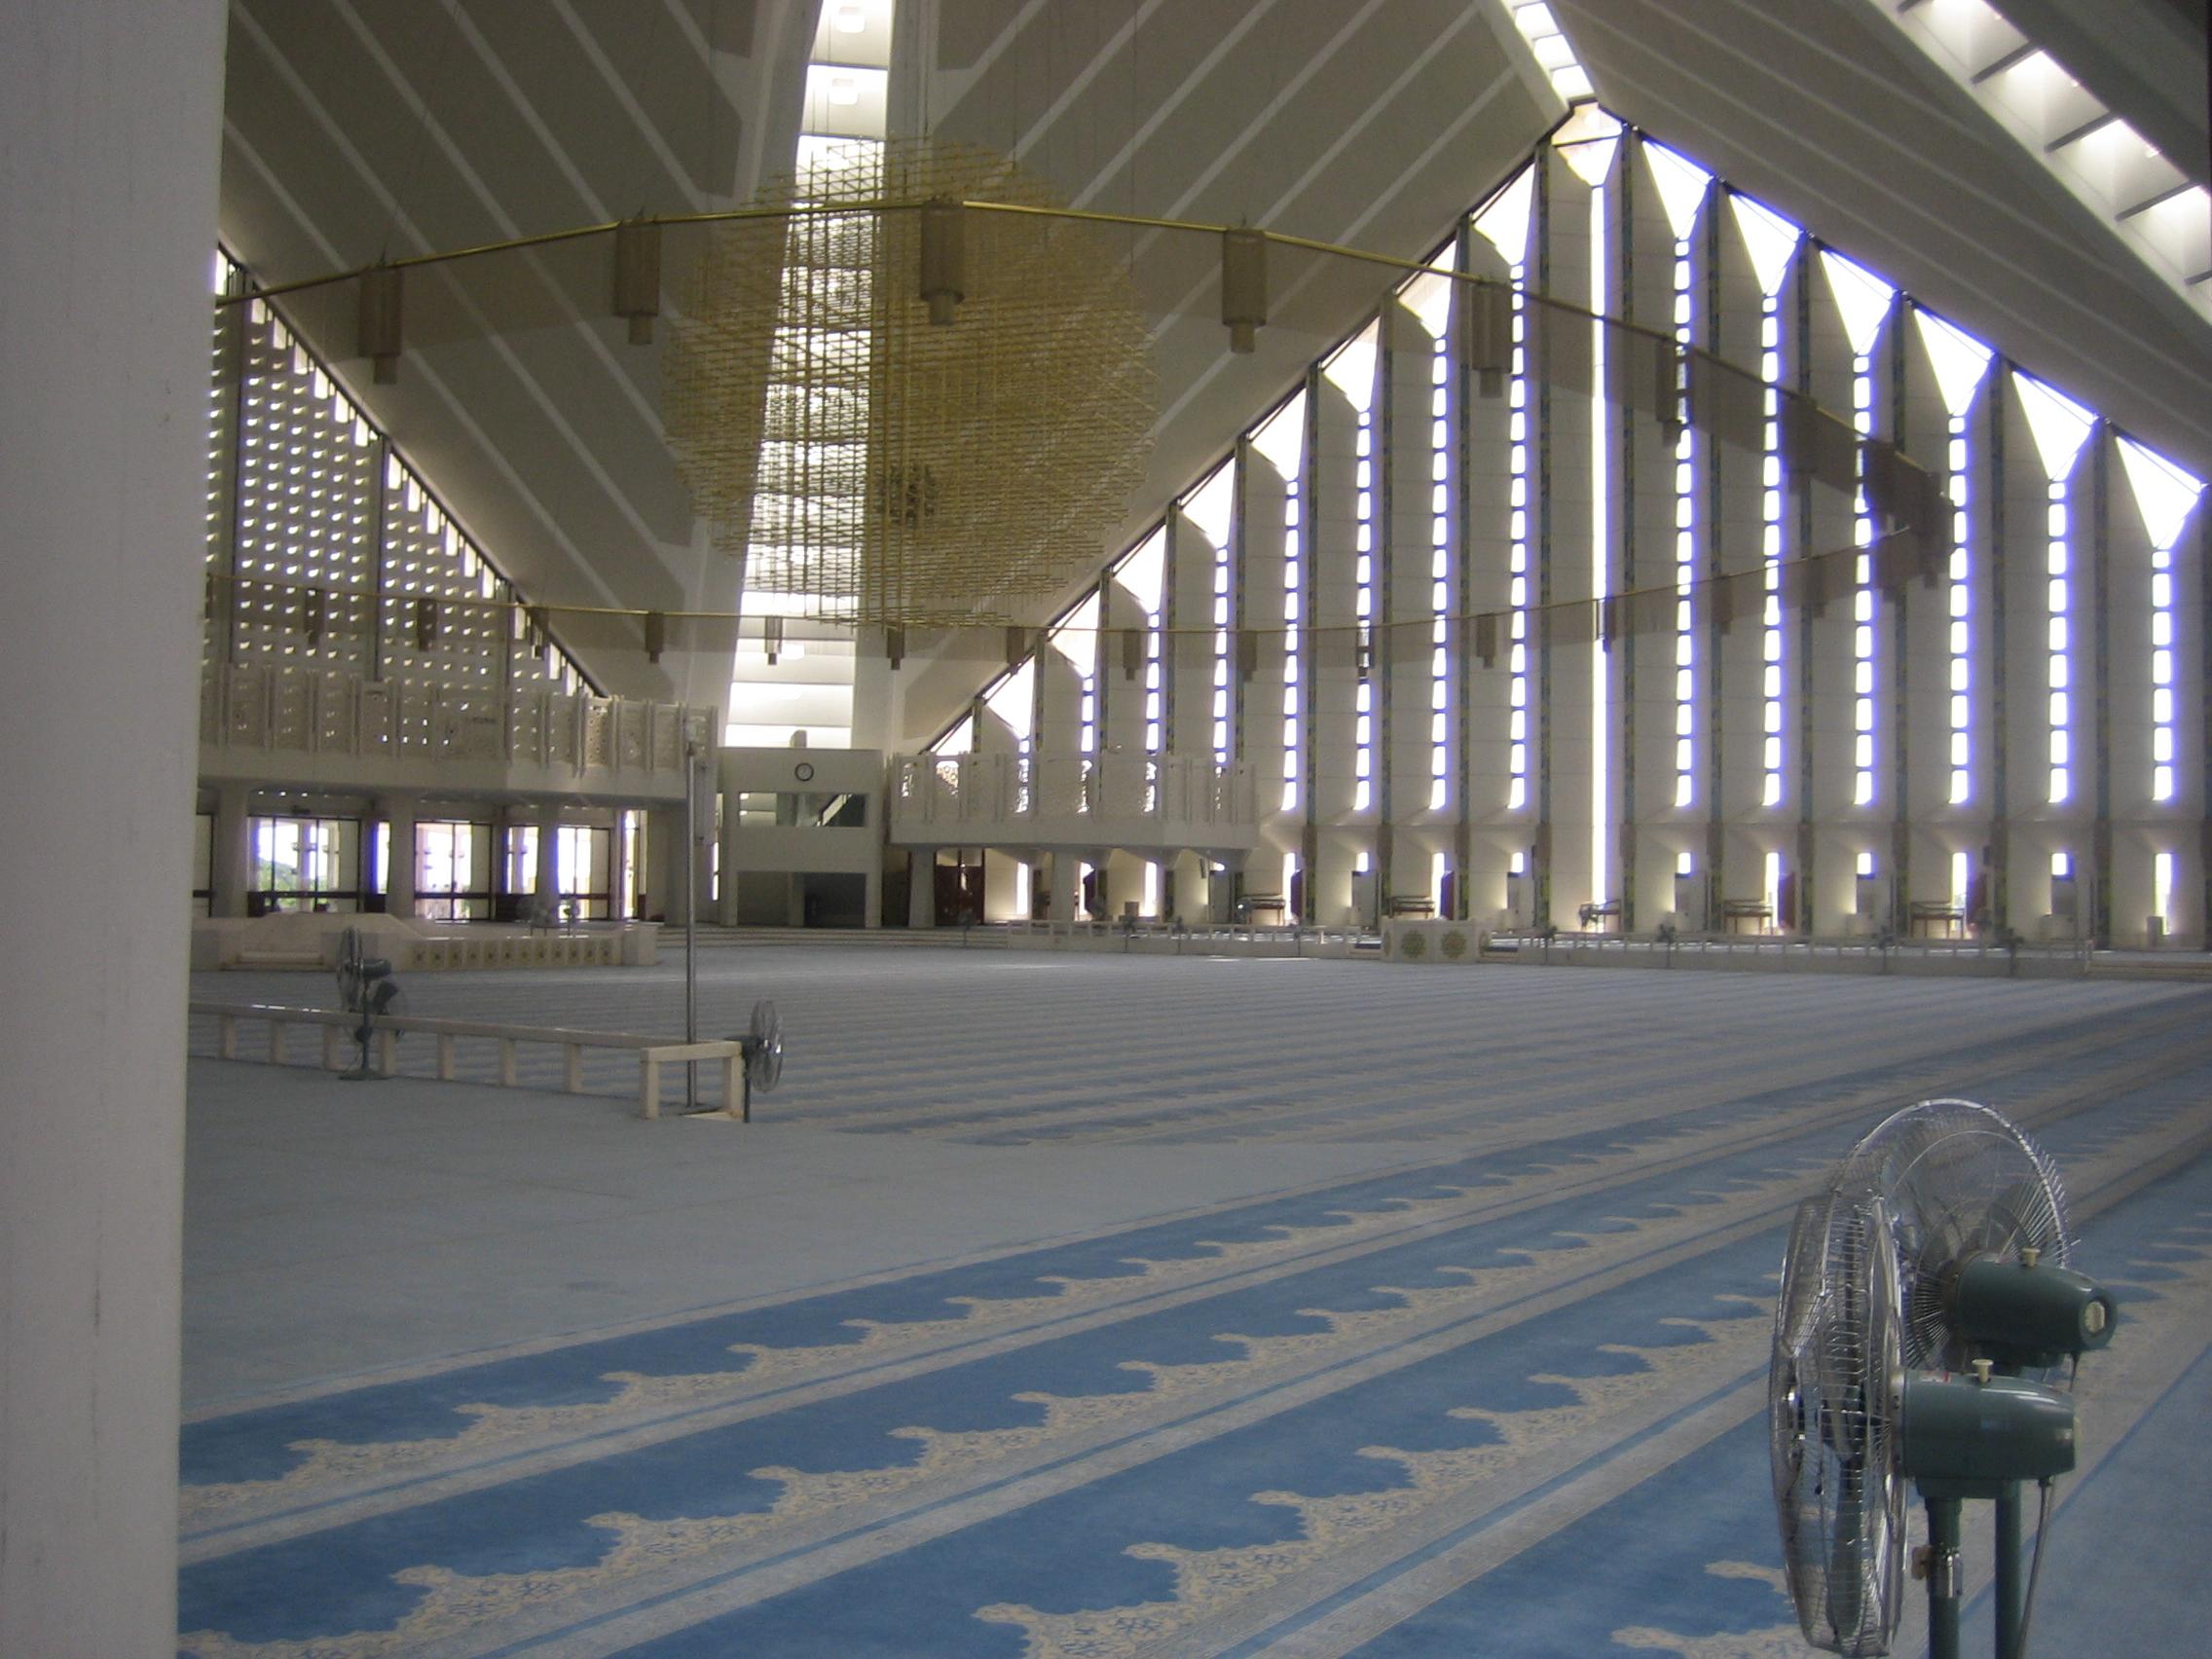 File:Inside Shah Faisal Mosque.jpg - Wikimedia Commons